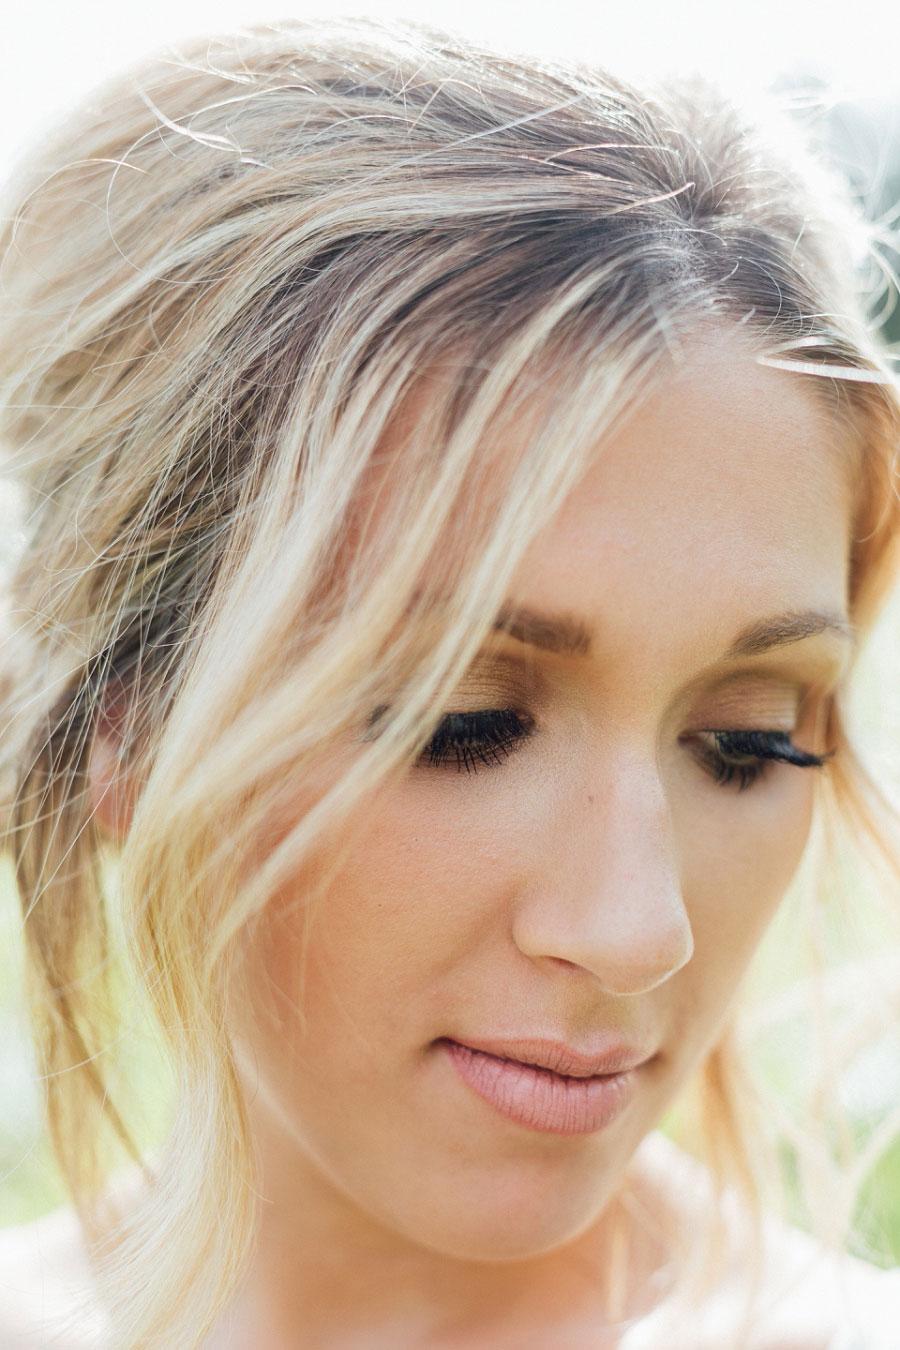 Romantic Vineyard Bridal Shoot With Dusty Blues & Greys0021